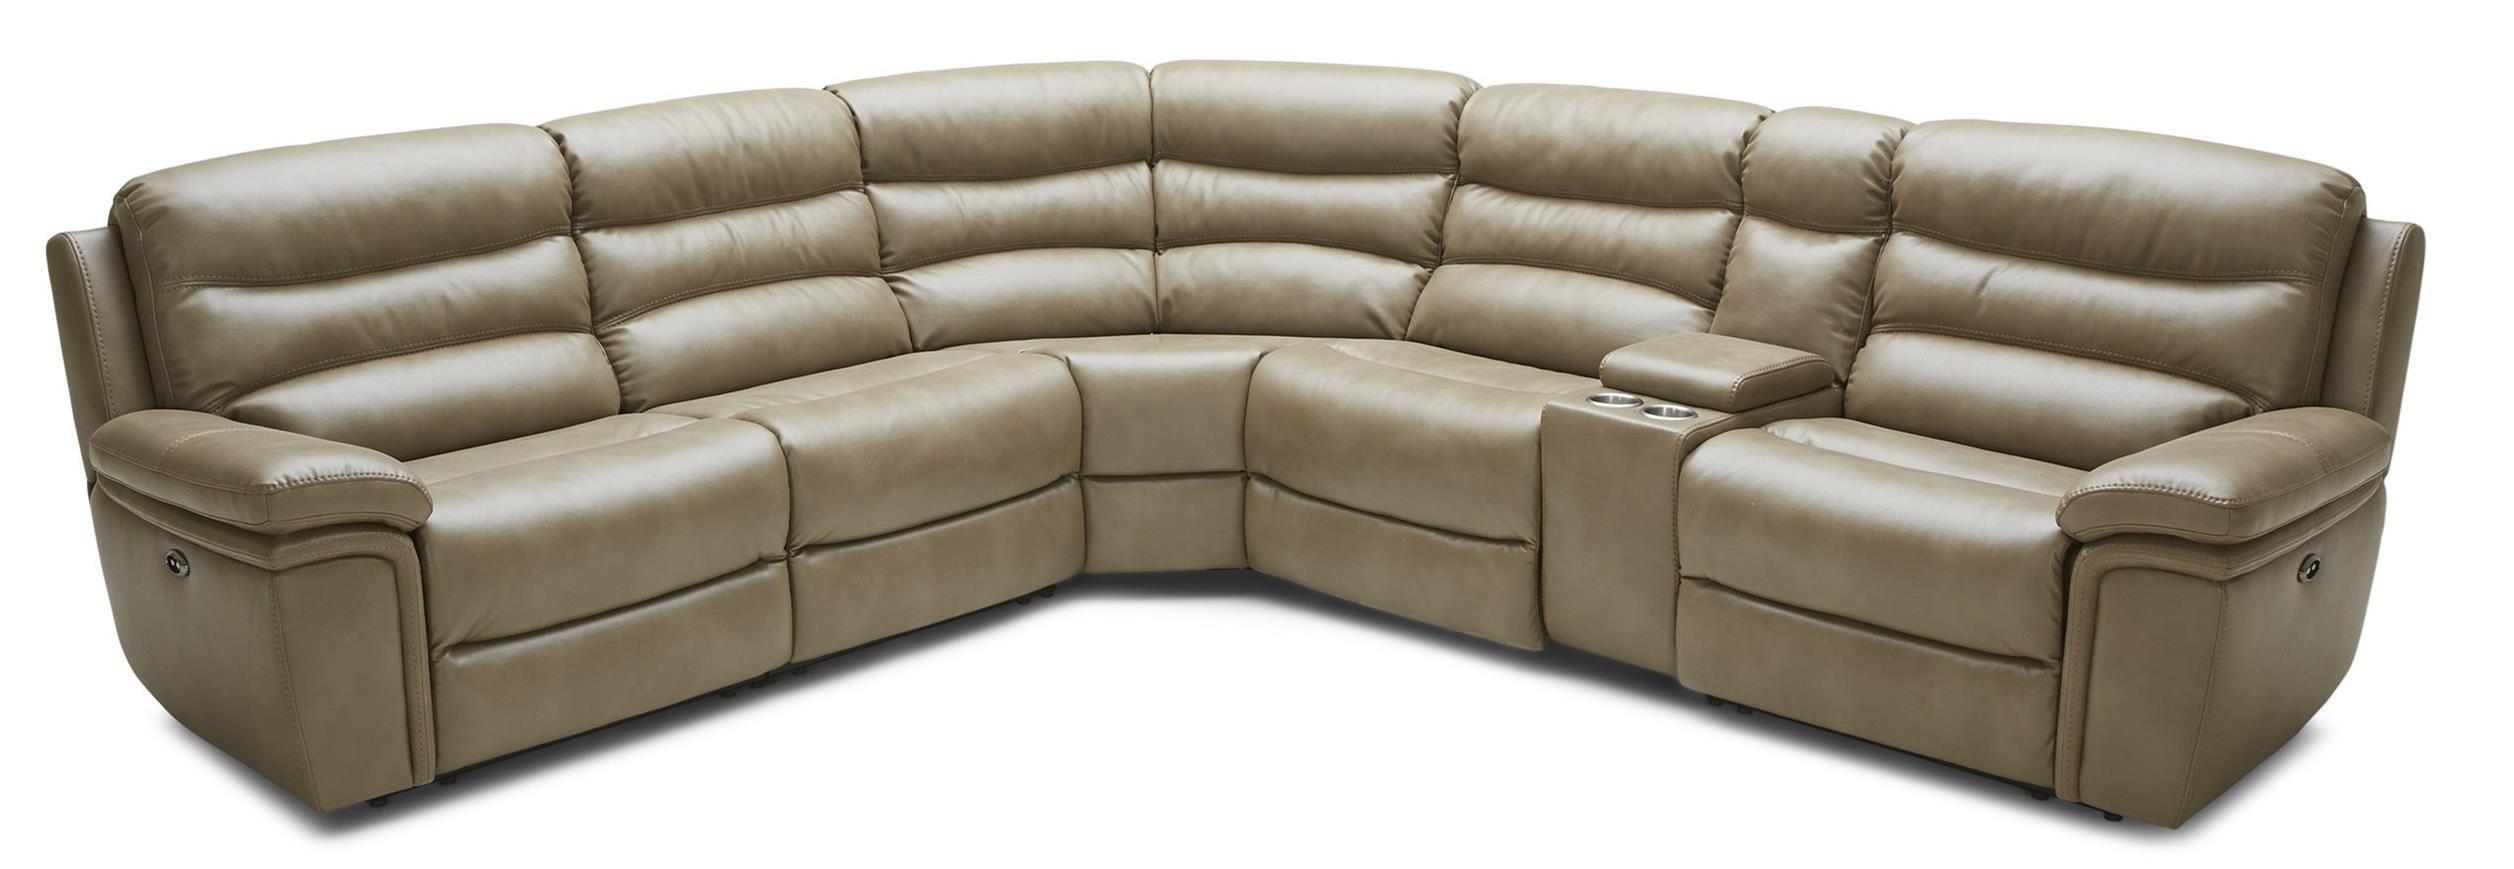 kuka home km008 casual six piece power reclining sectional sofa with rh becksfurniture com